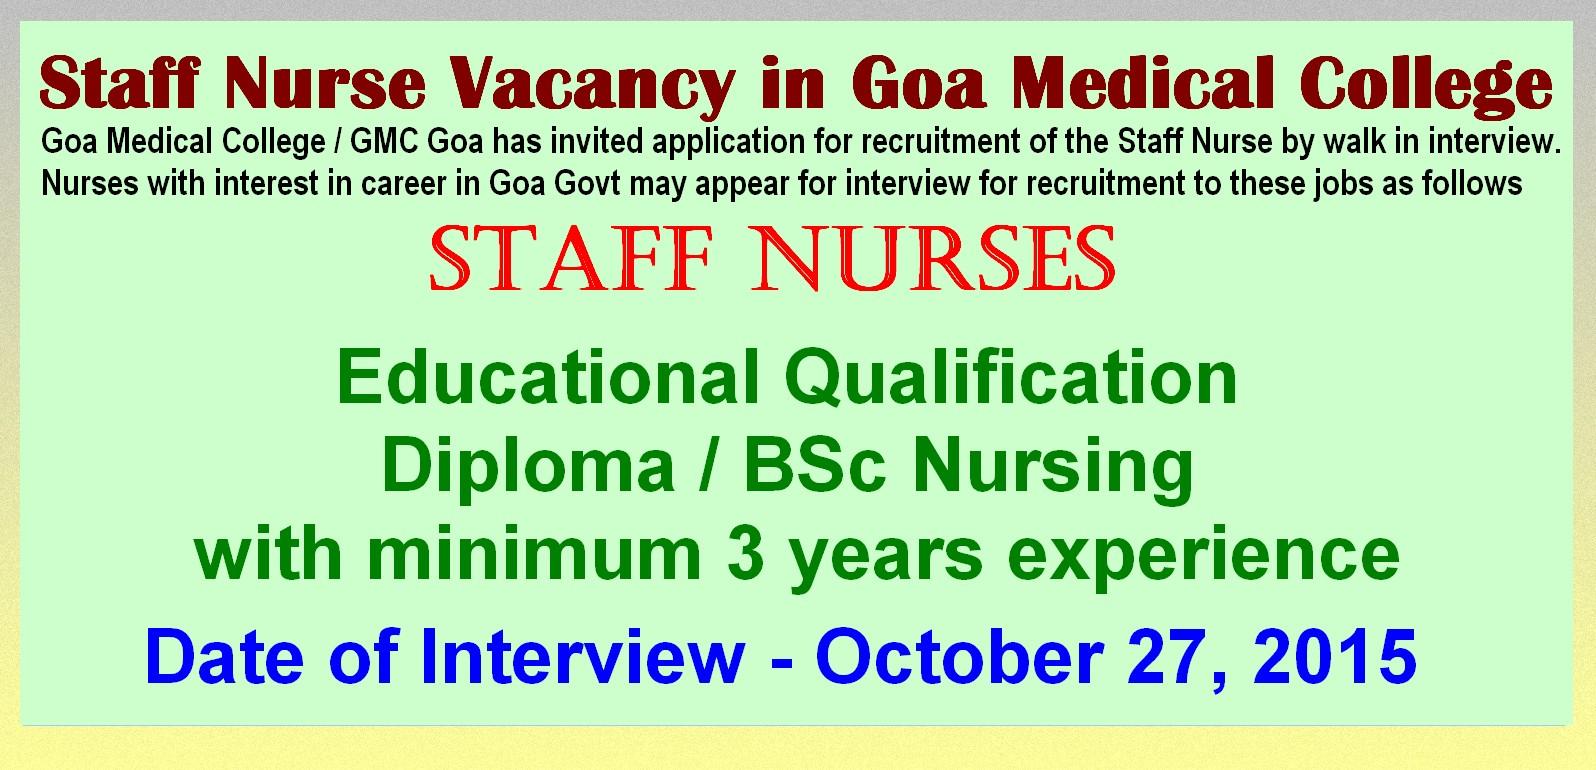 nurses job vacancy staff nurse vacancy in goa medical college  goa medical college gmc goa has invited application for recruitment of the staff nurse by walk in interview nurses interest in career in goa govt